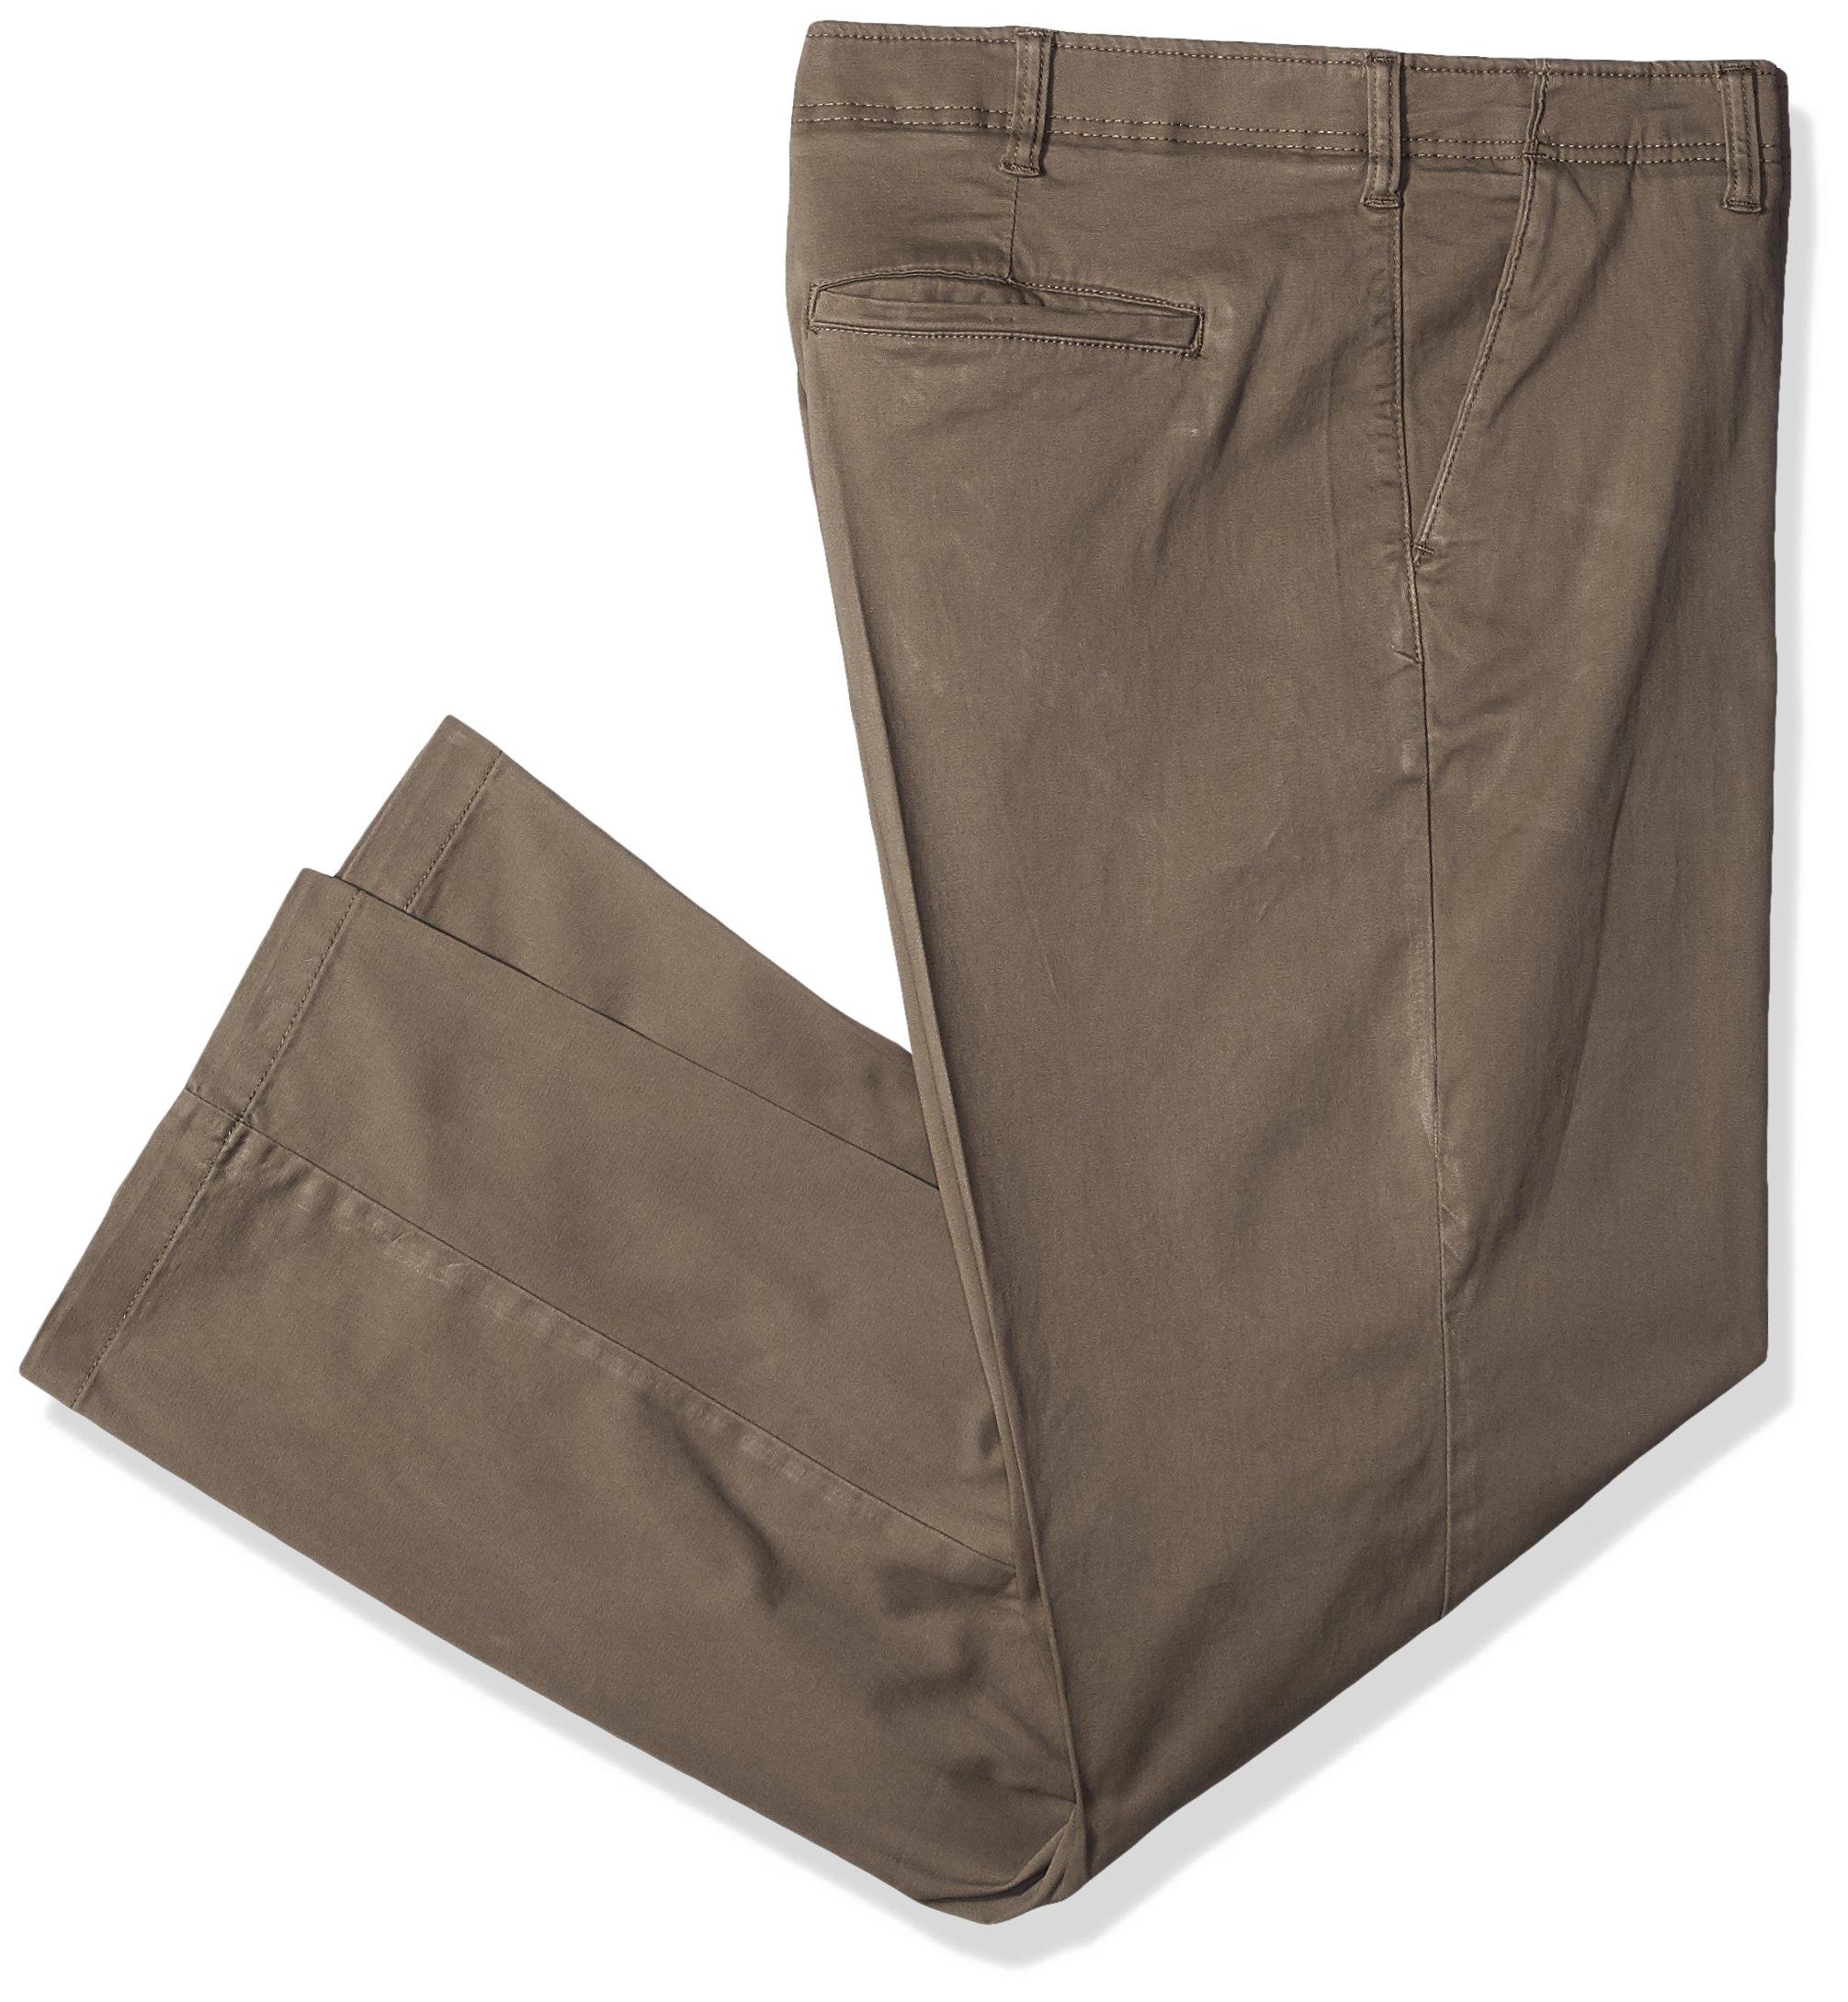 Lee Men's Big and Tall Performance Series Extreme Comfort Khaki Pant, Woodspice, 50W x 30L